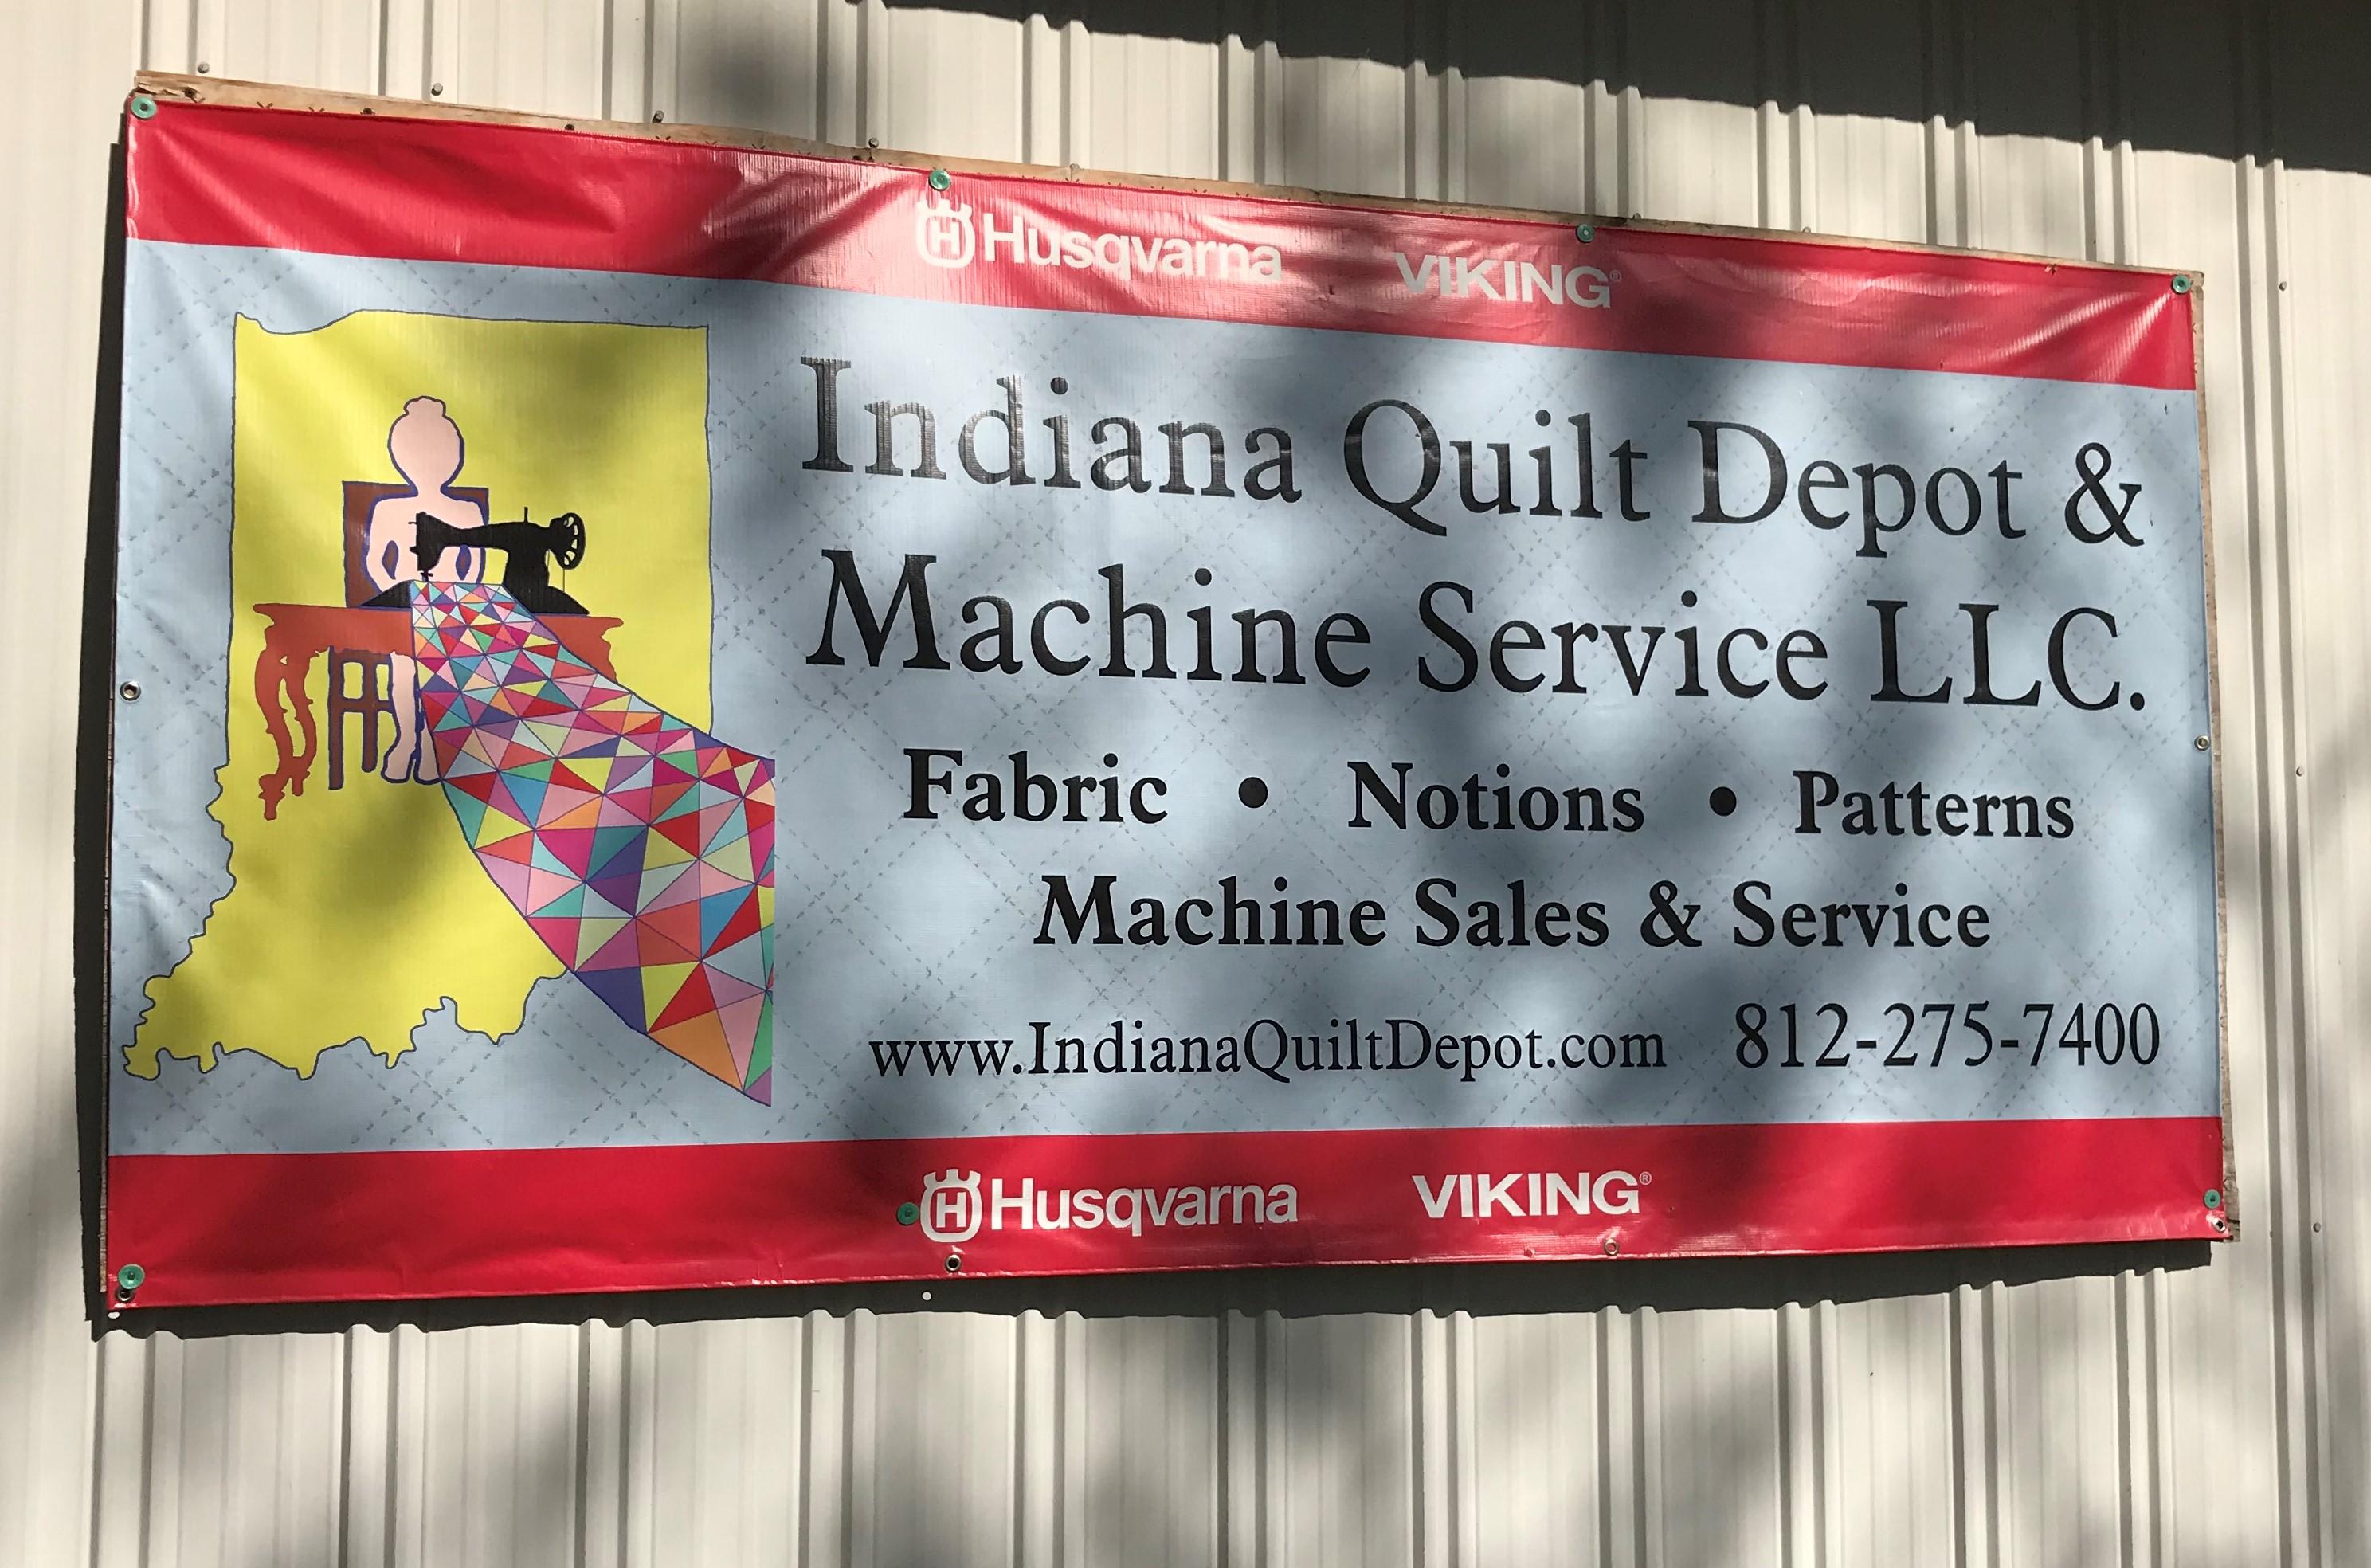 Indiana Quilt Depot